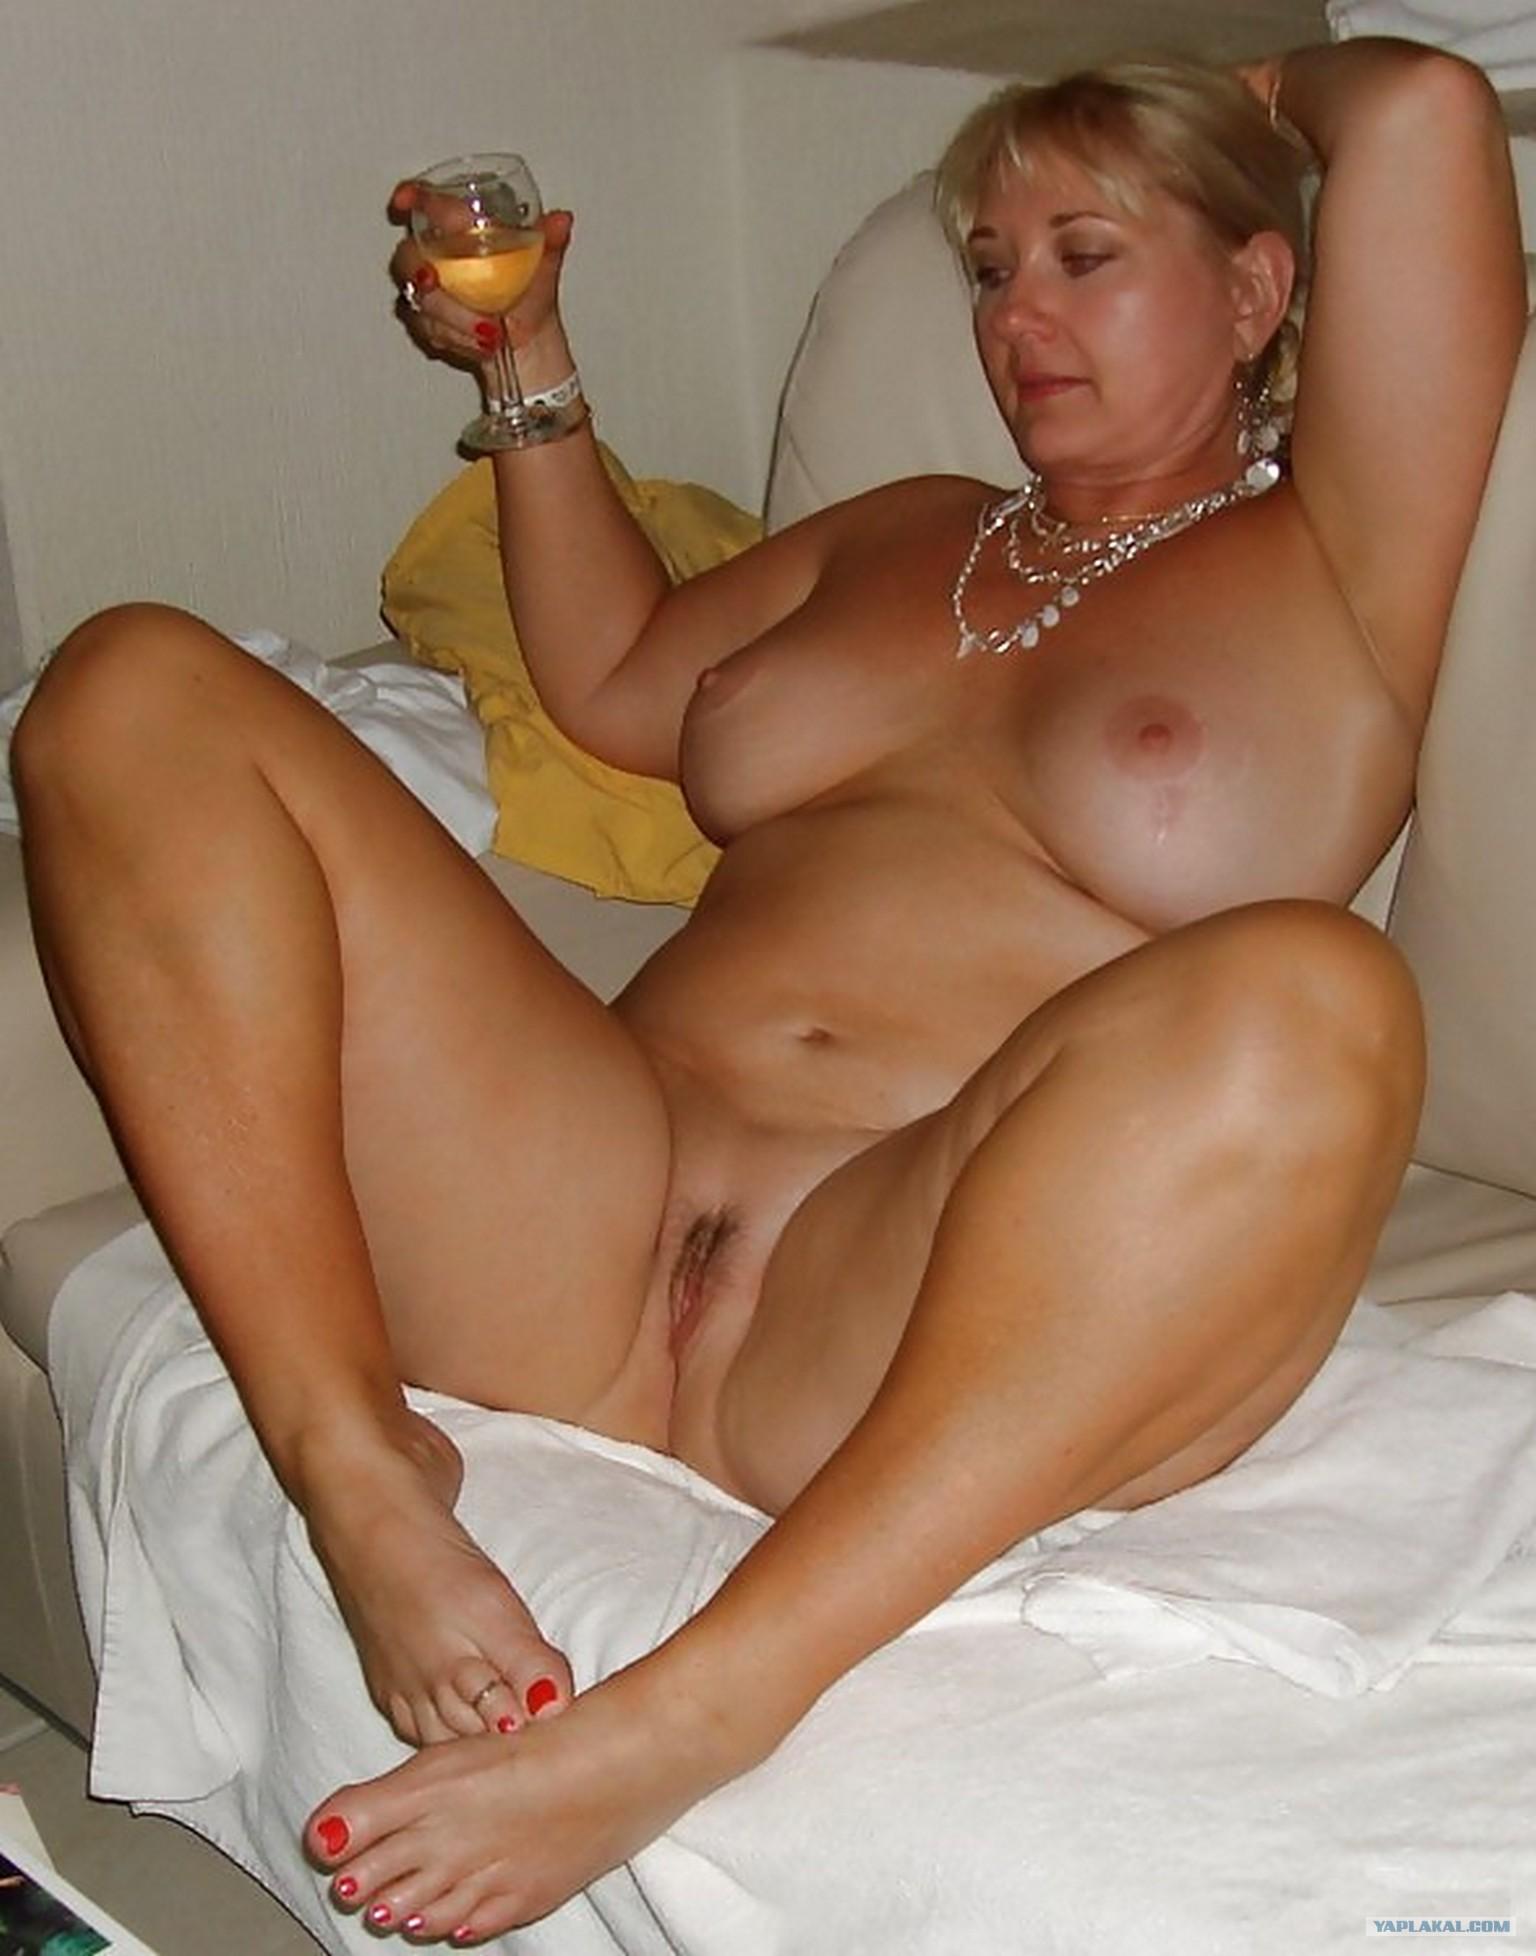 eroticheskie-foto-pornuhi-russkie-zrelie-zhenshini-slizala-porno-visokom